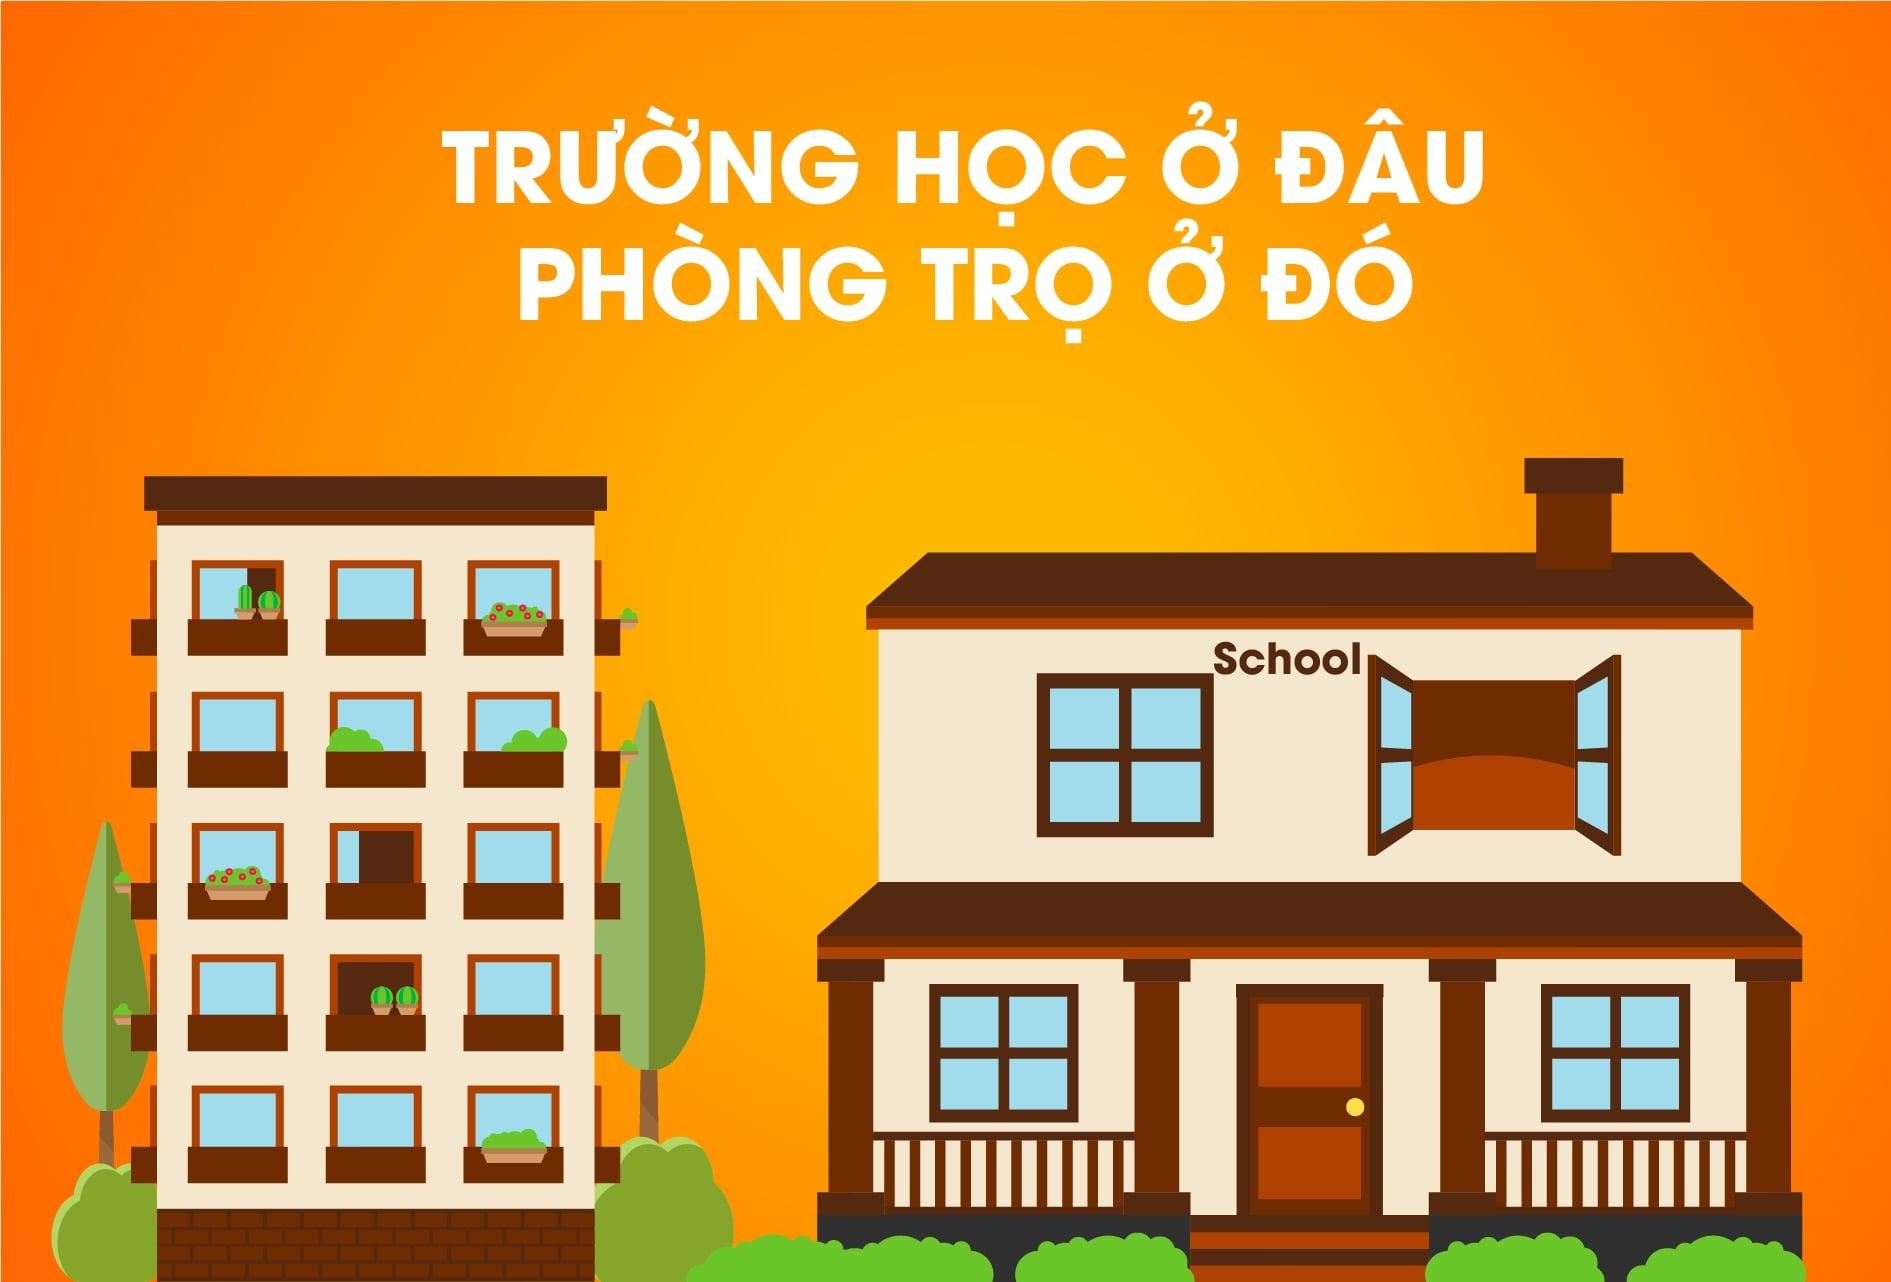 truong-hoc-gan-phong-tro